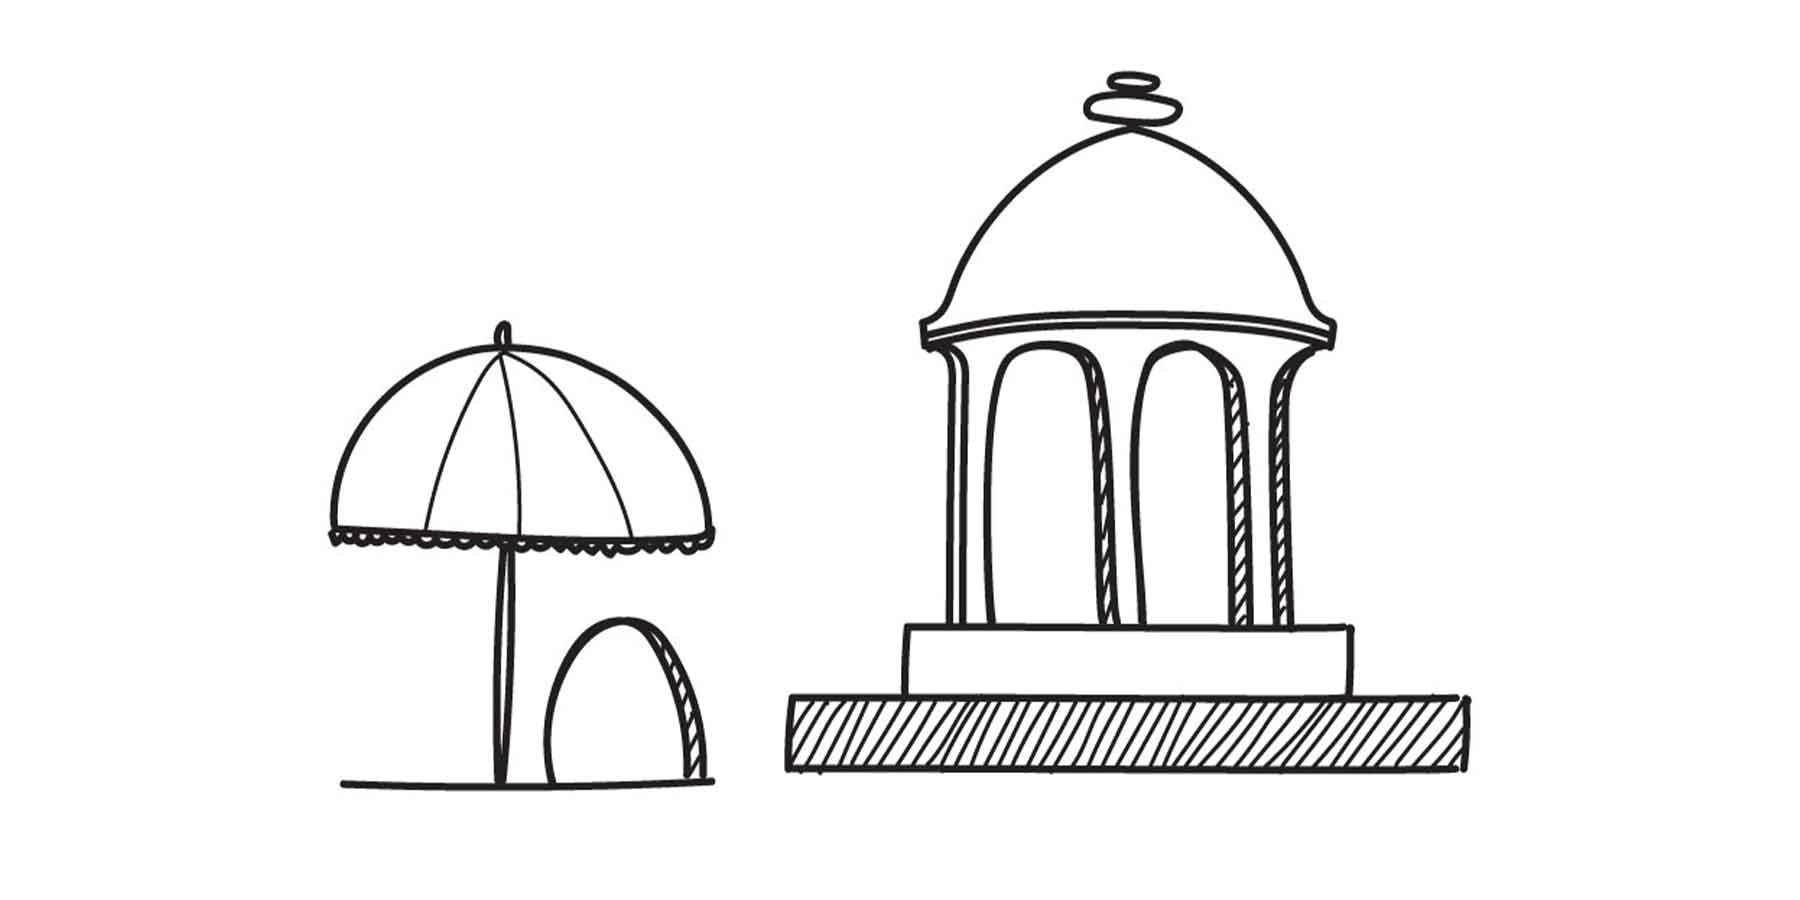 The Rajput's umbrella